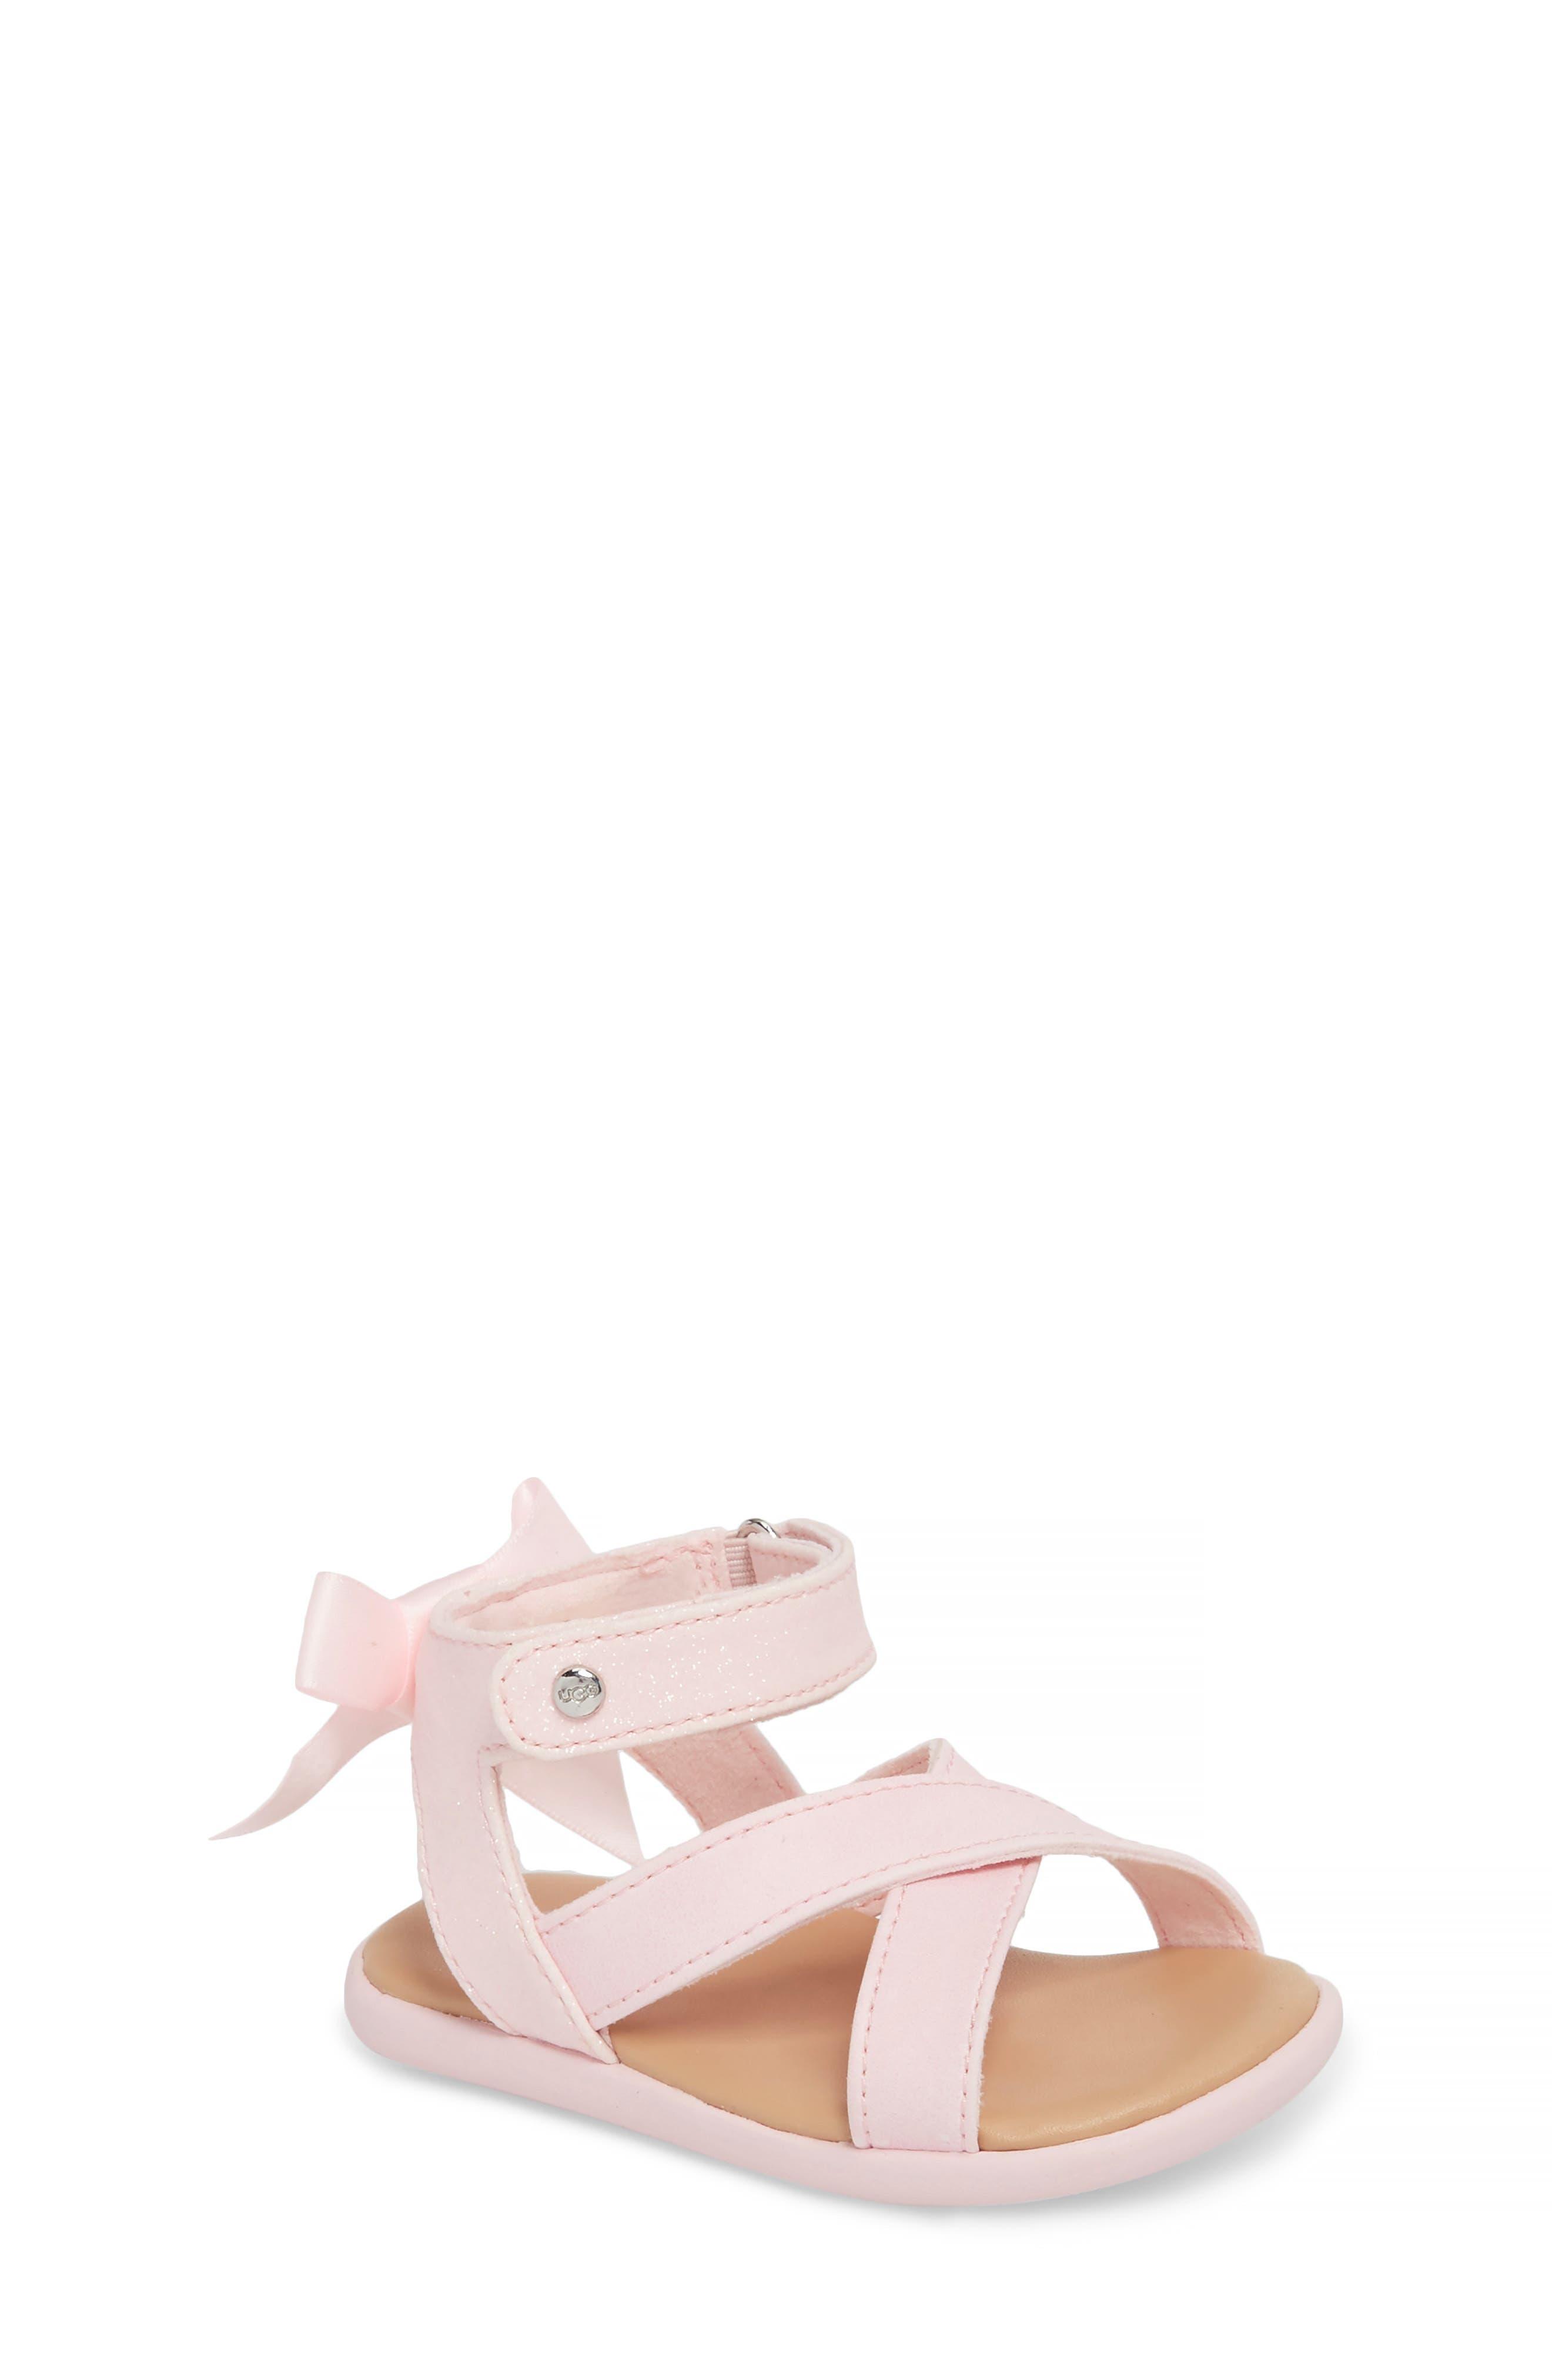 Maggiepie Sparkles Sandal,                             Main thumbnail 1, color,                             Seashell Pink